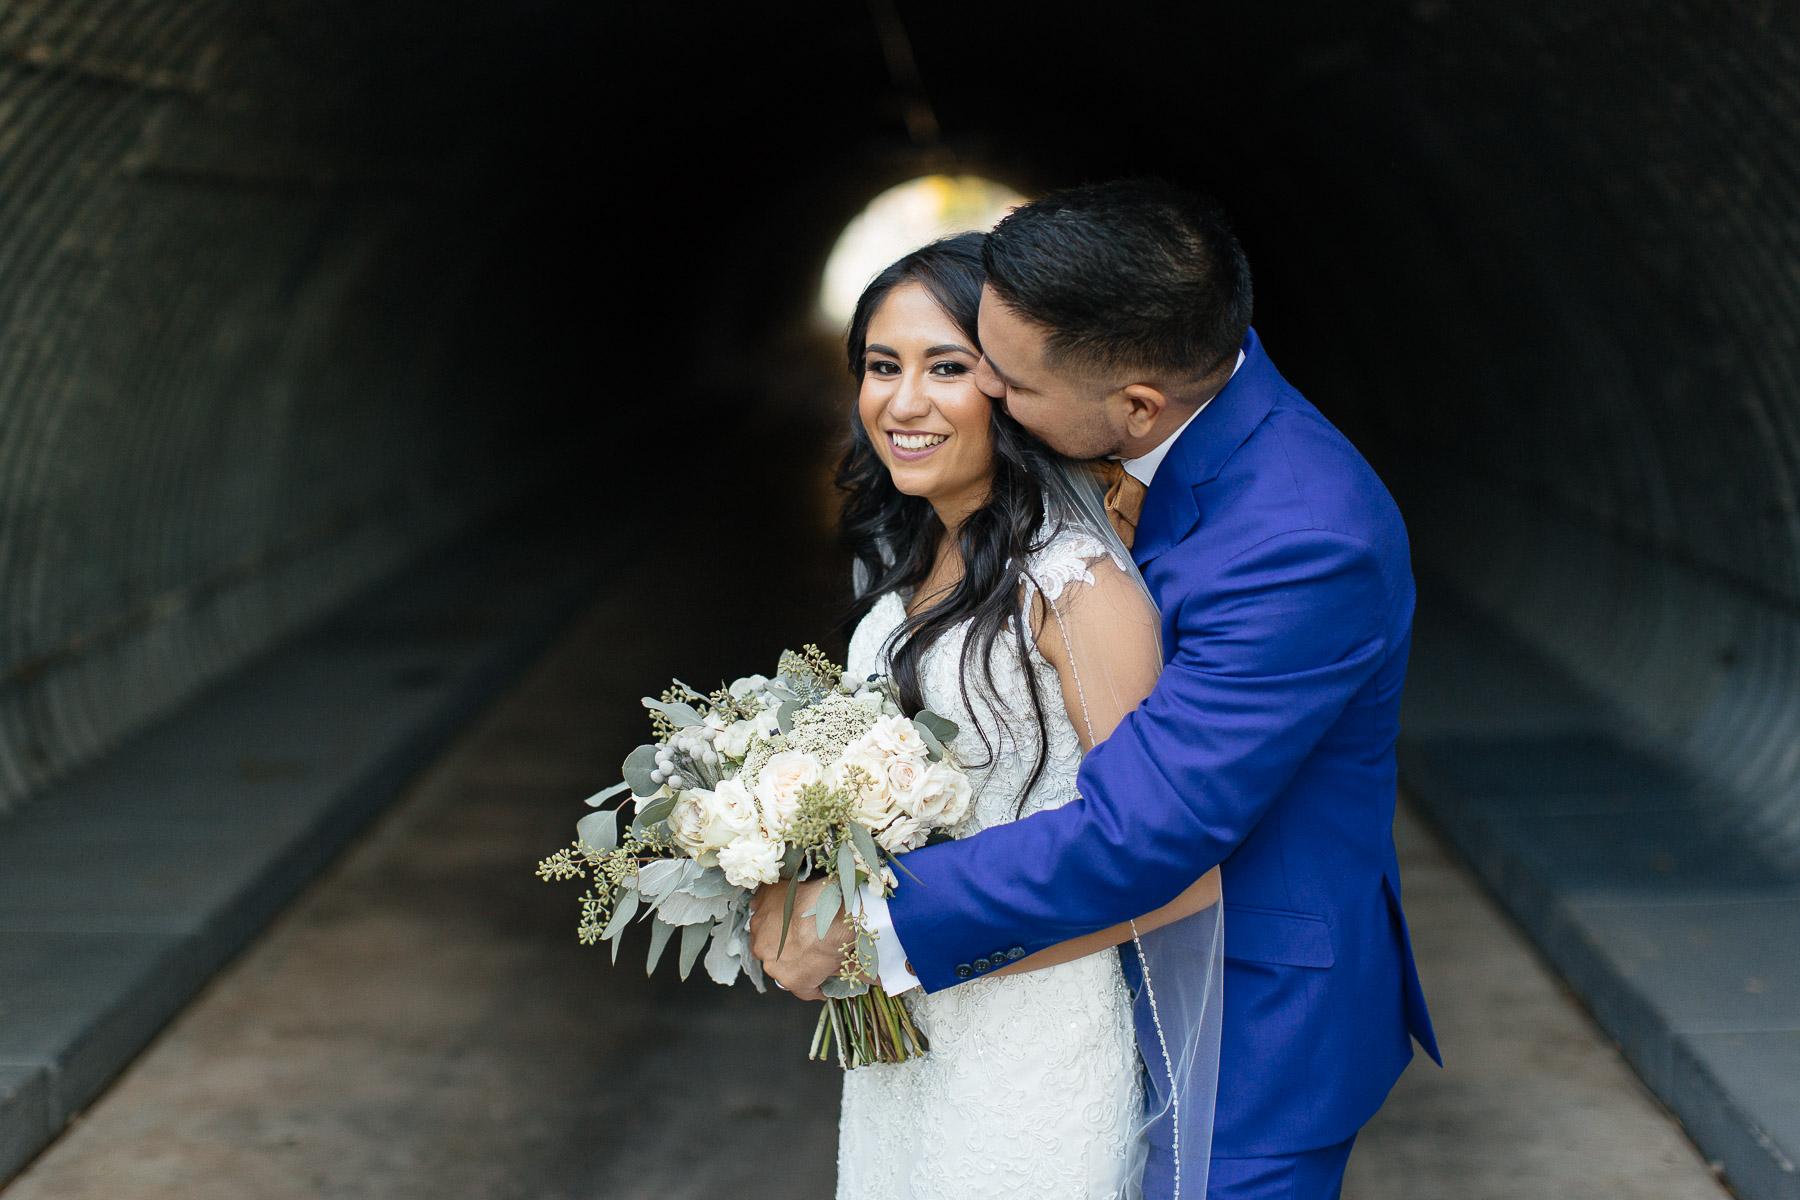 161029-Luxium-Weddings-Arizona-Jeff-Griselda-First-Look-Val-Vista-Lakes-Gilber-067.jpg